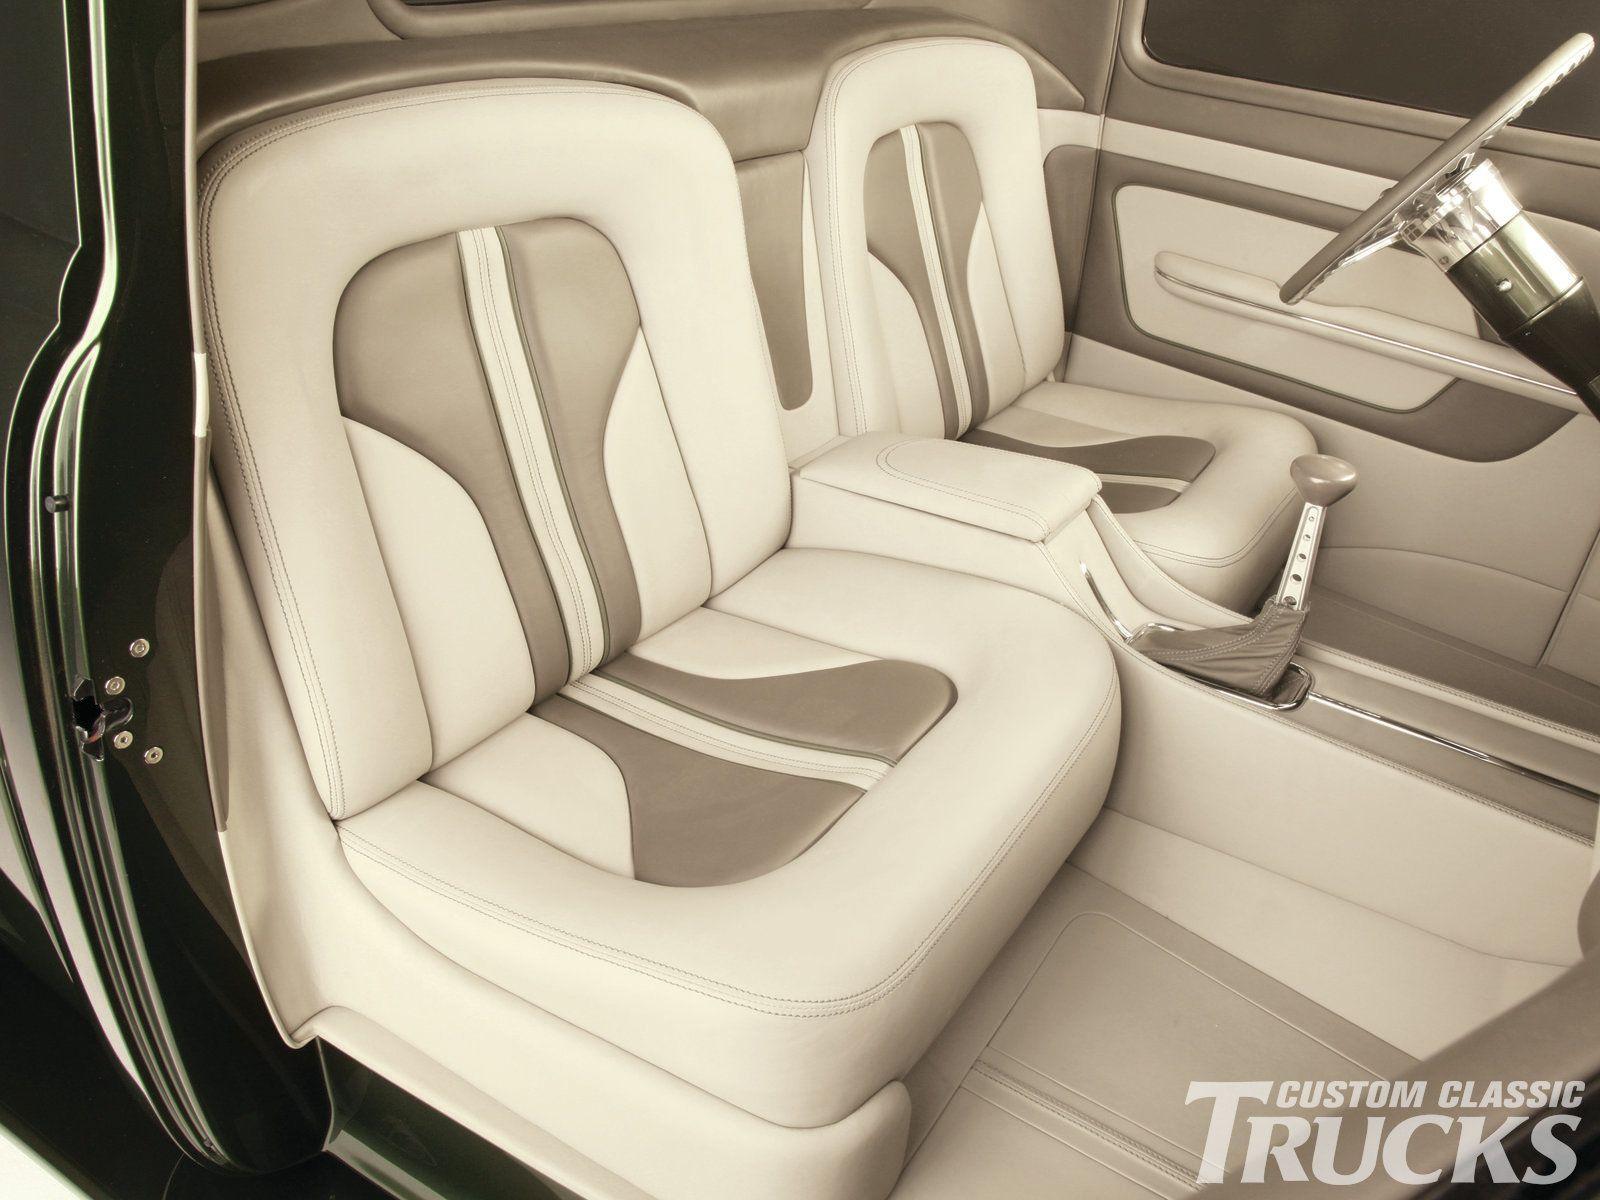 Custom car interior queens ny - 1212cct 11 O 1953 Chevrolet Truck Gabes Custom Interior Seats Photo 7